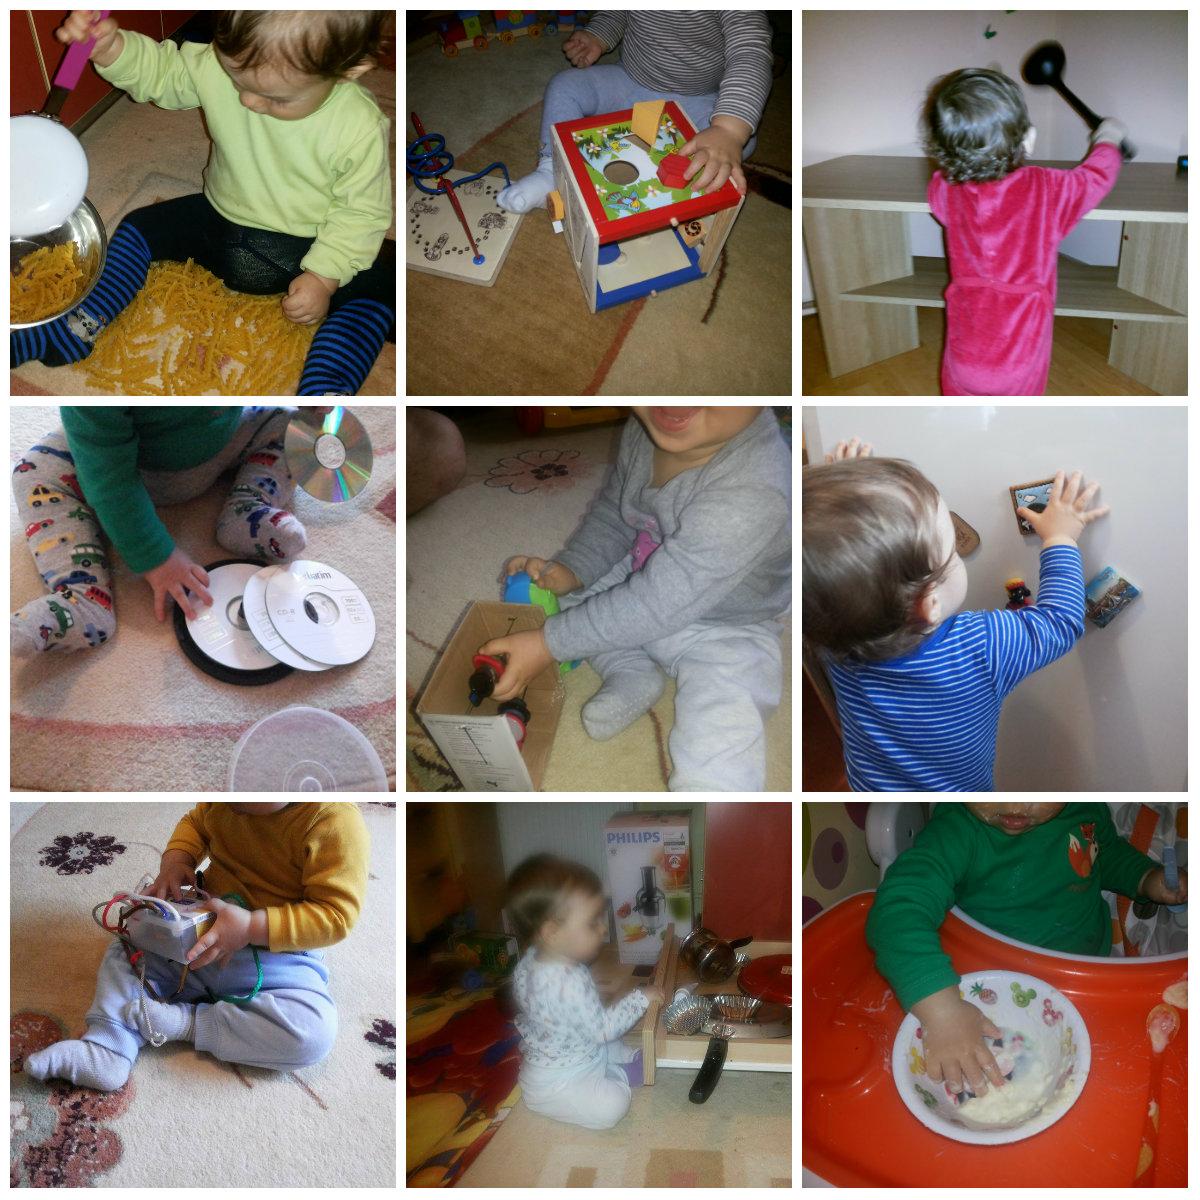 activitati jocuri jucarii pentru bebelusi 10 luni fun parenting by cristina buja. Black Bedroom Furniture Sets. Home Design Ideas